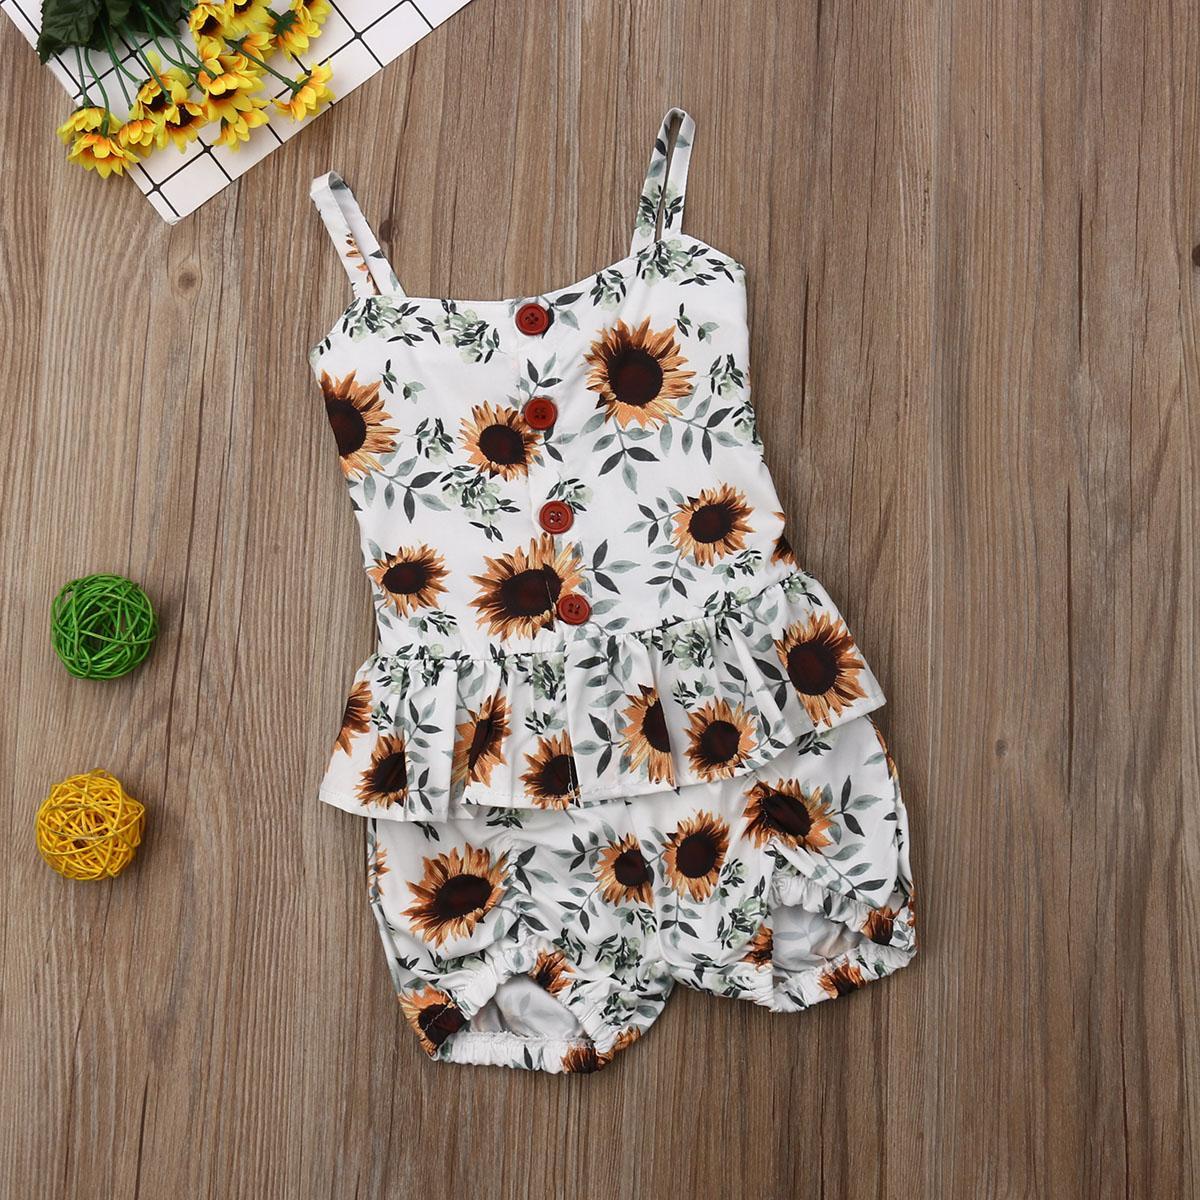 Niño del bebé embroma la ropa del verano floral sin mangas volante Tops Shorts Trajes Set 2pcs